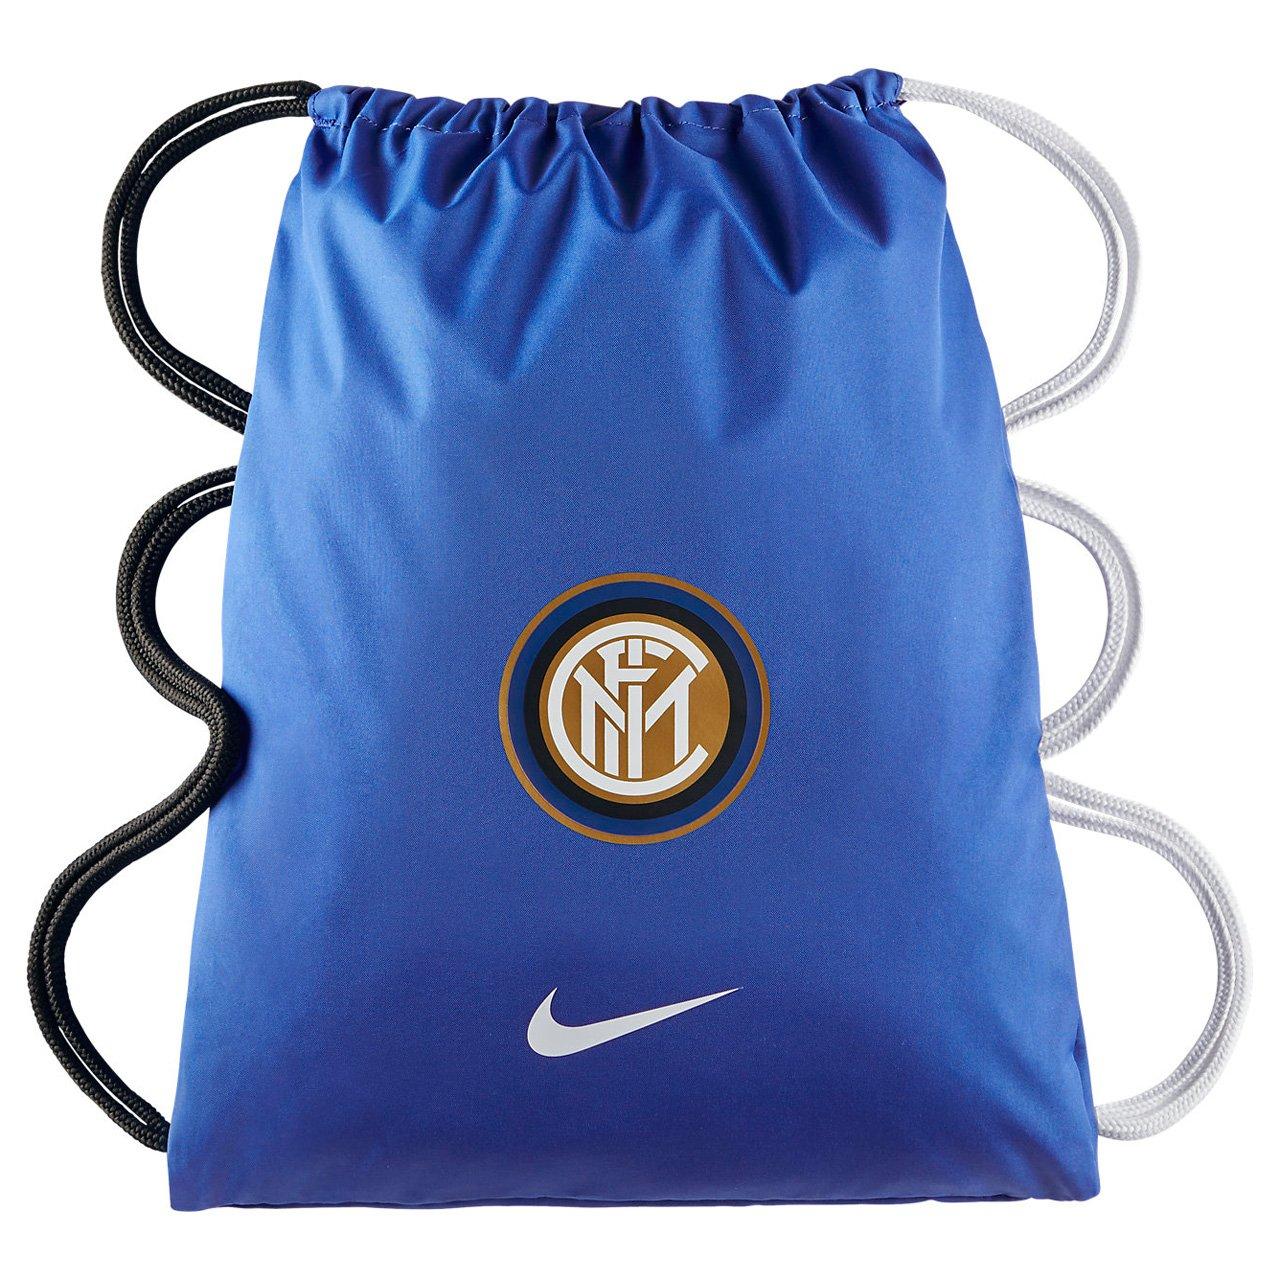 Allegiance Nike Milan Inter SackUnisexSack Gym NkZ8n0OwPX